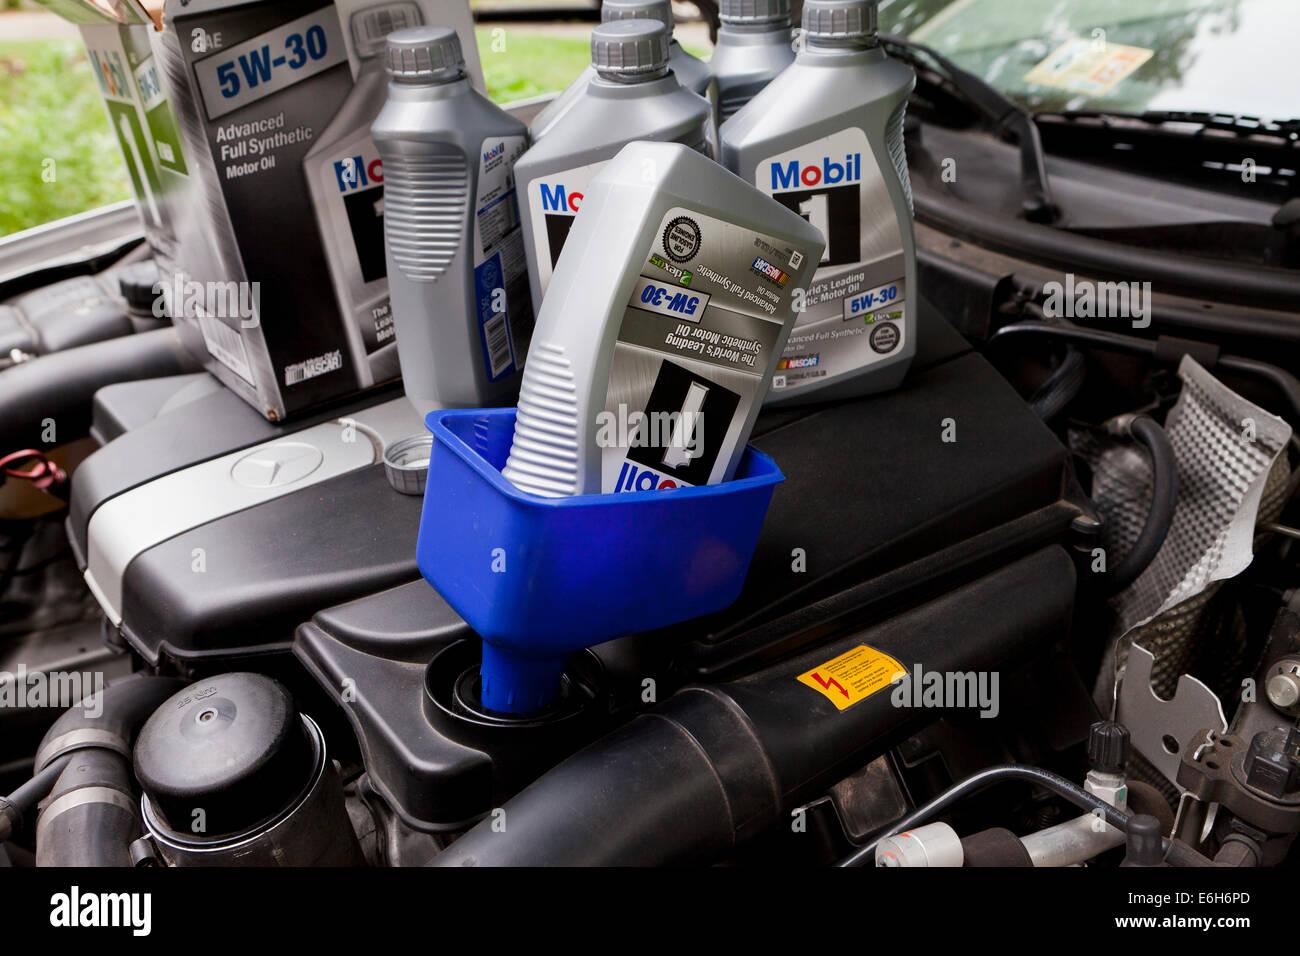 Mobile 1 motor oil in funnel - USA - Stock Image